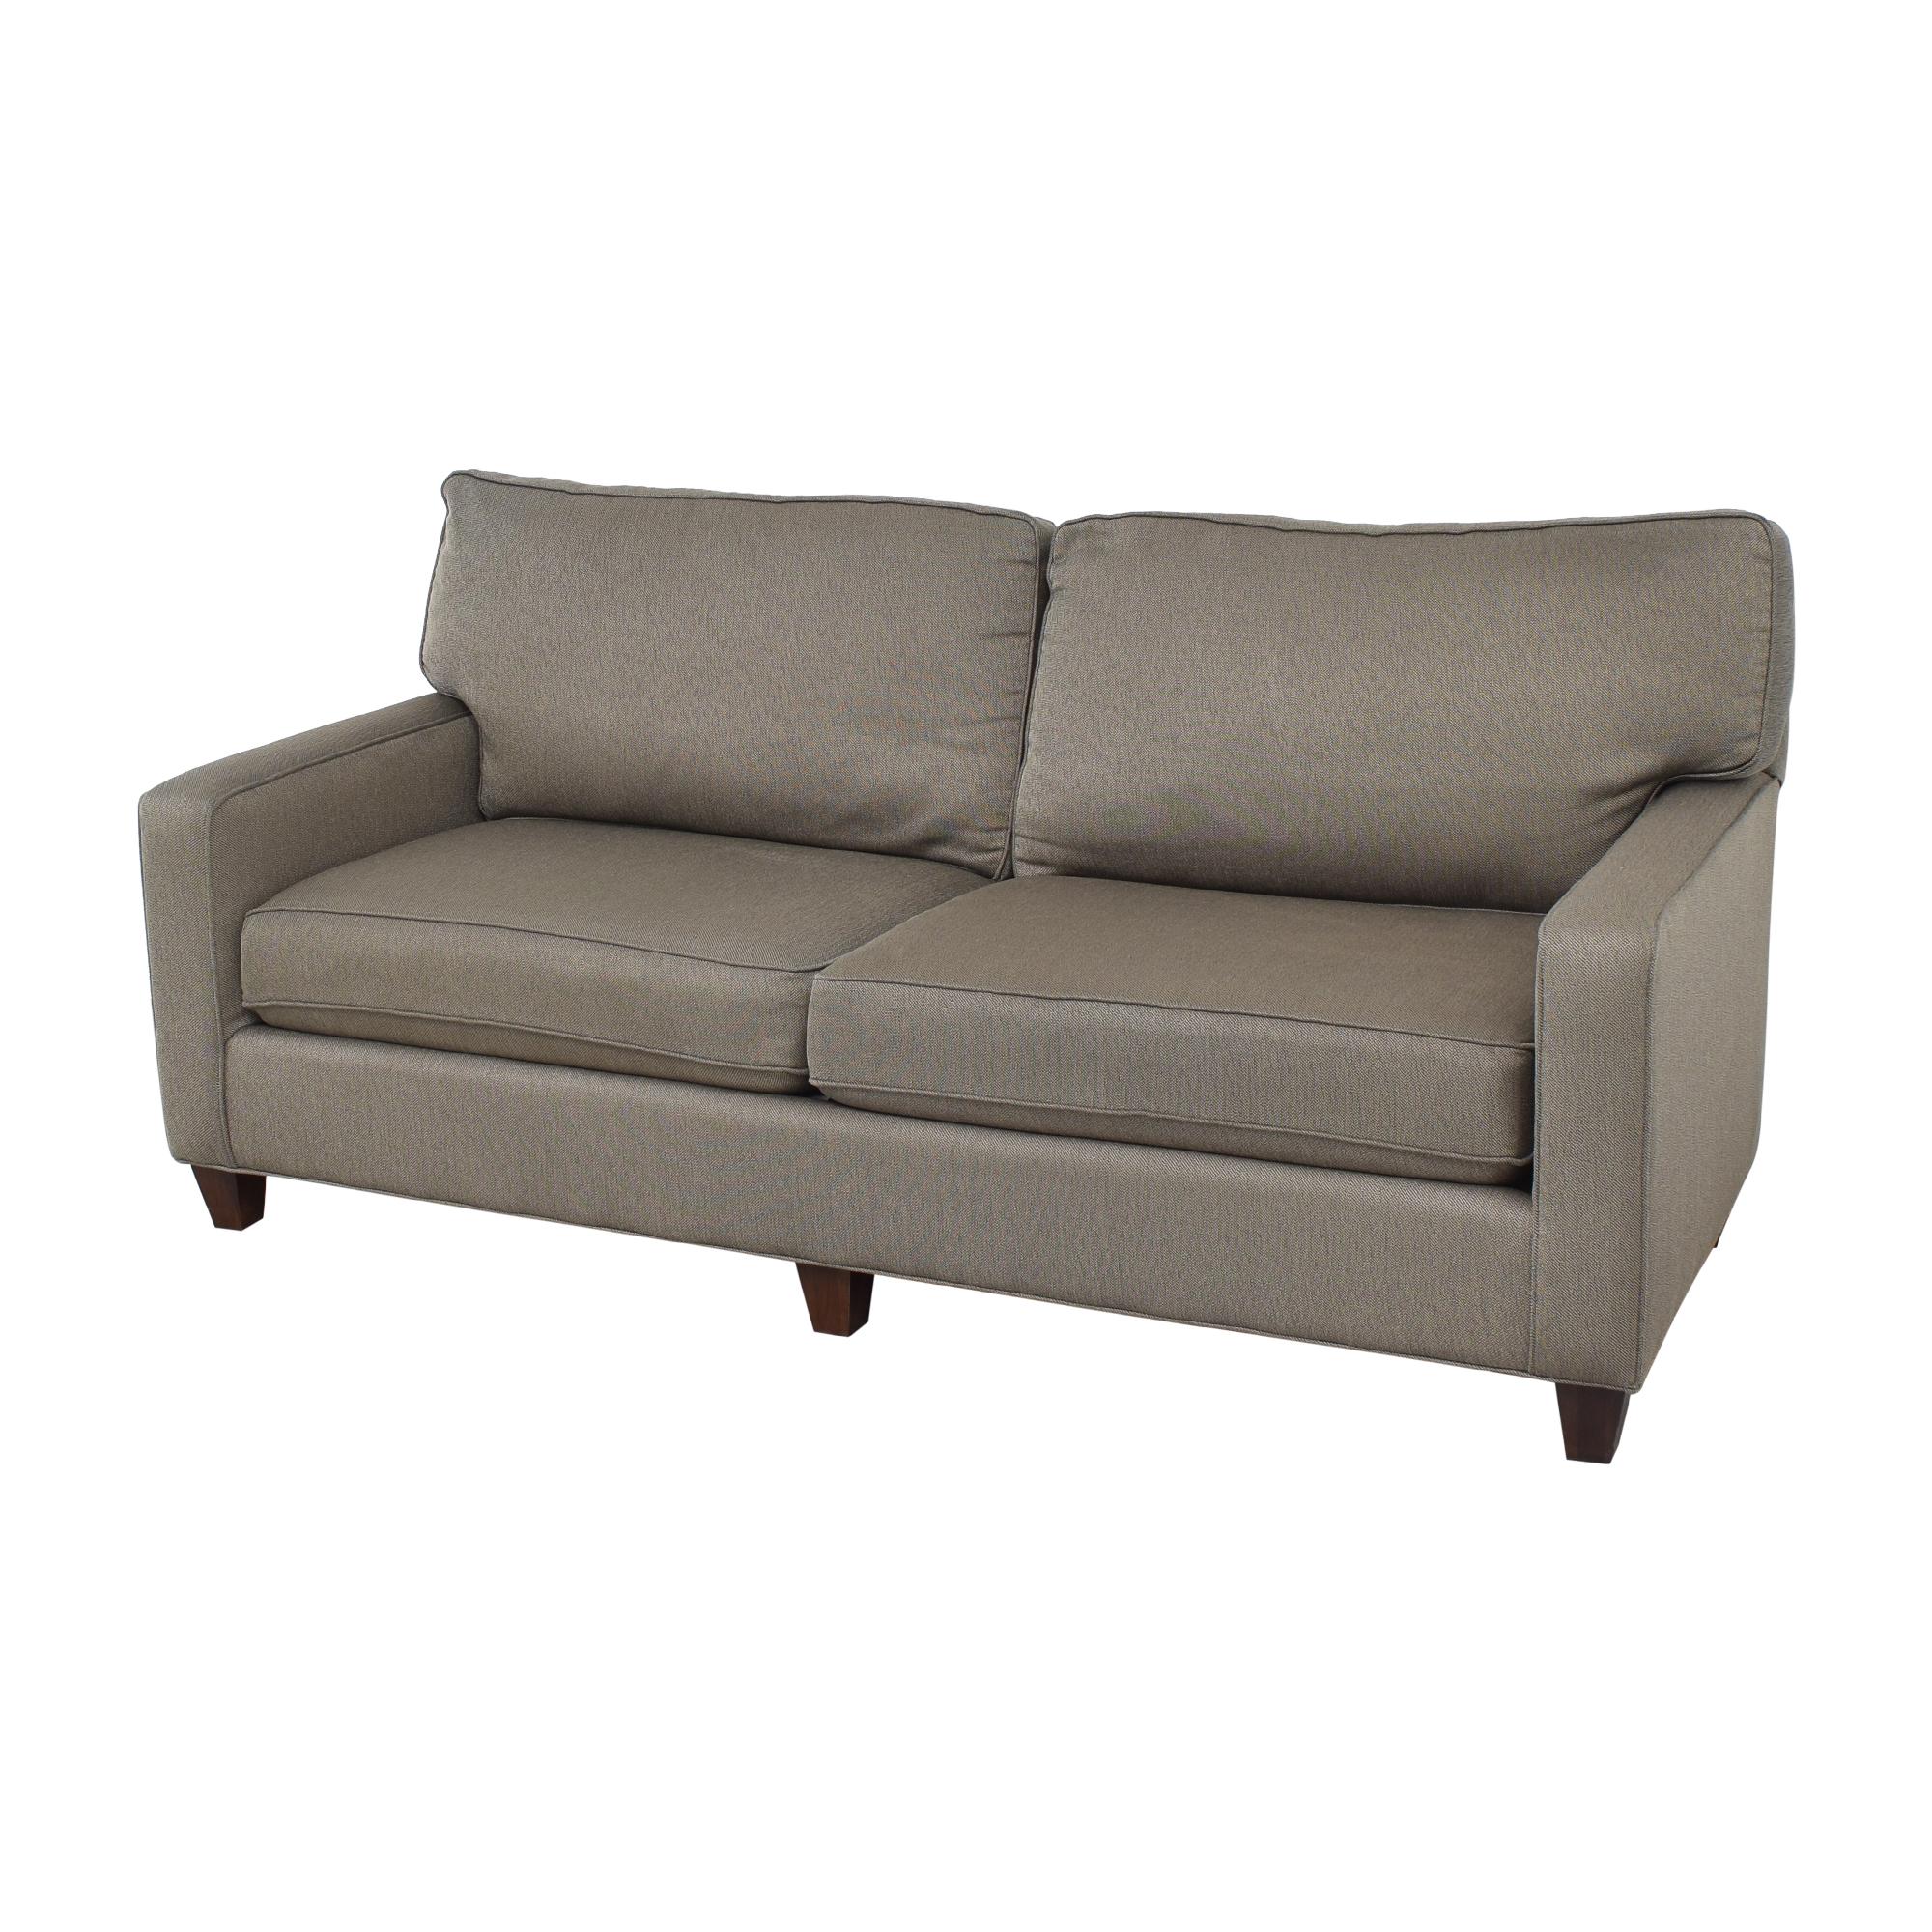 Bassett Furniture CU2 Sofa / Classic Sofas